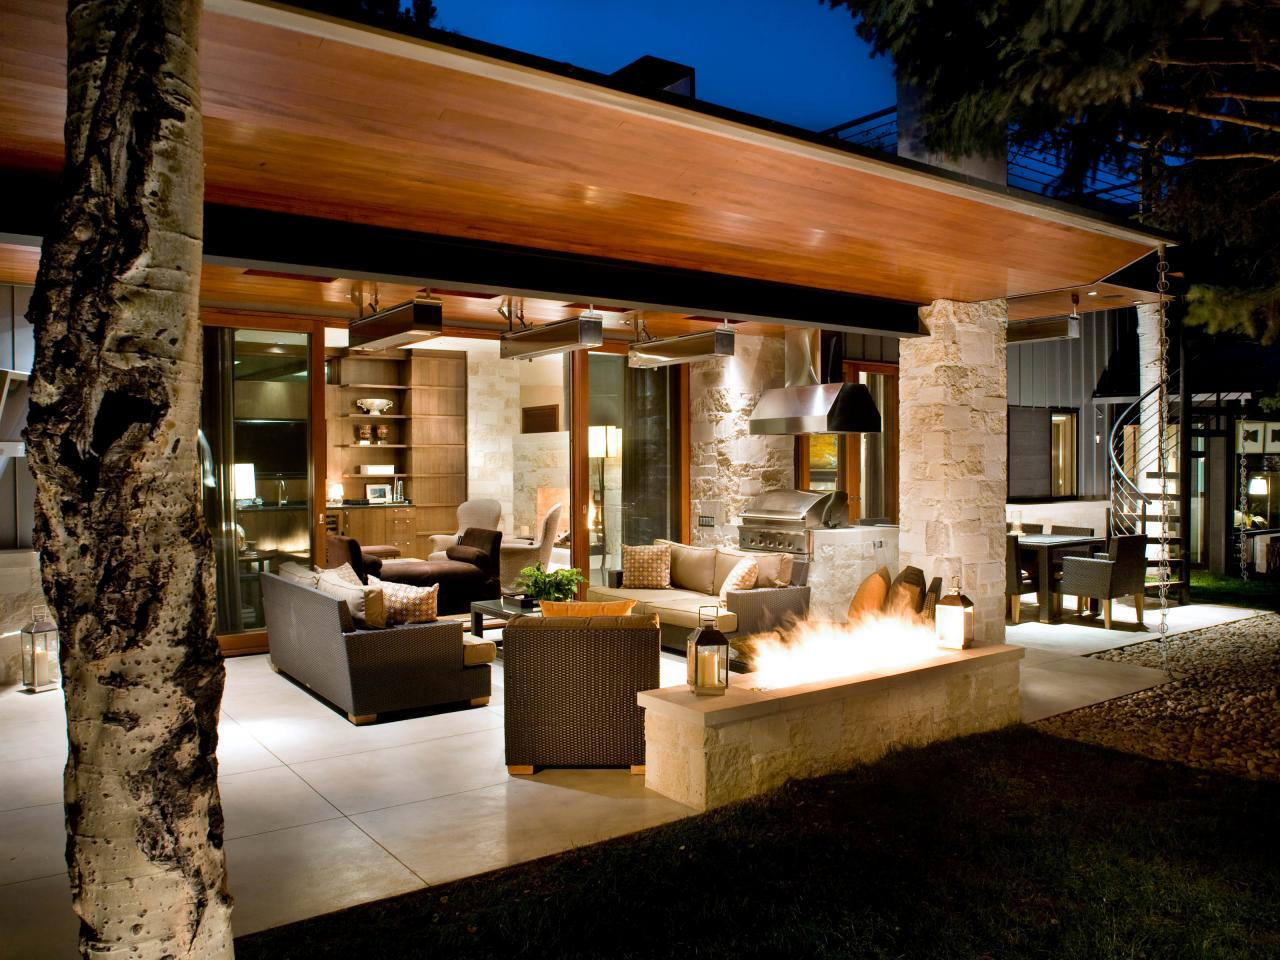 Effective-Outdoor-Kitchen-Designs-with-.